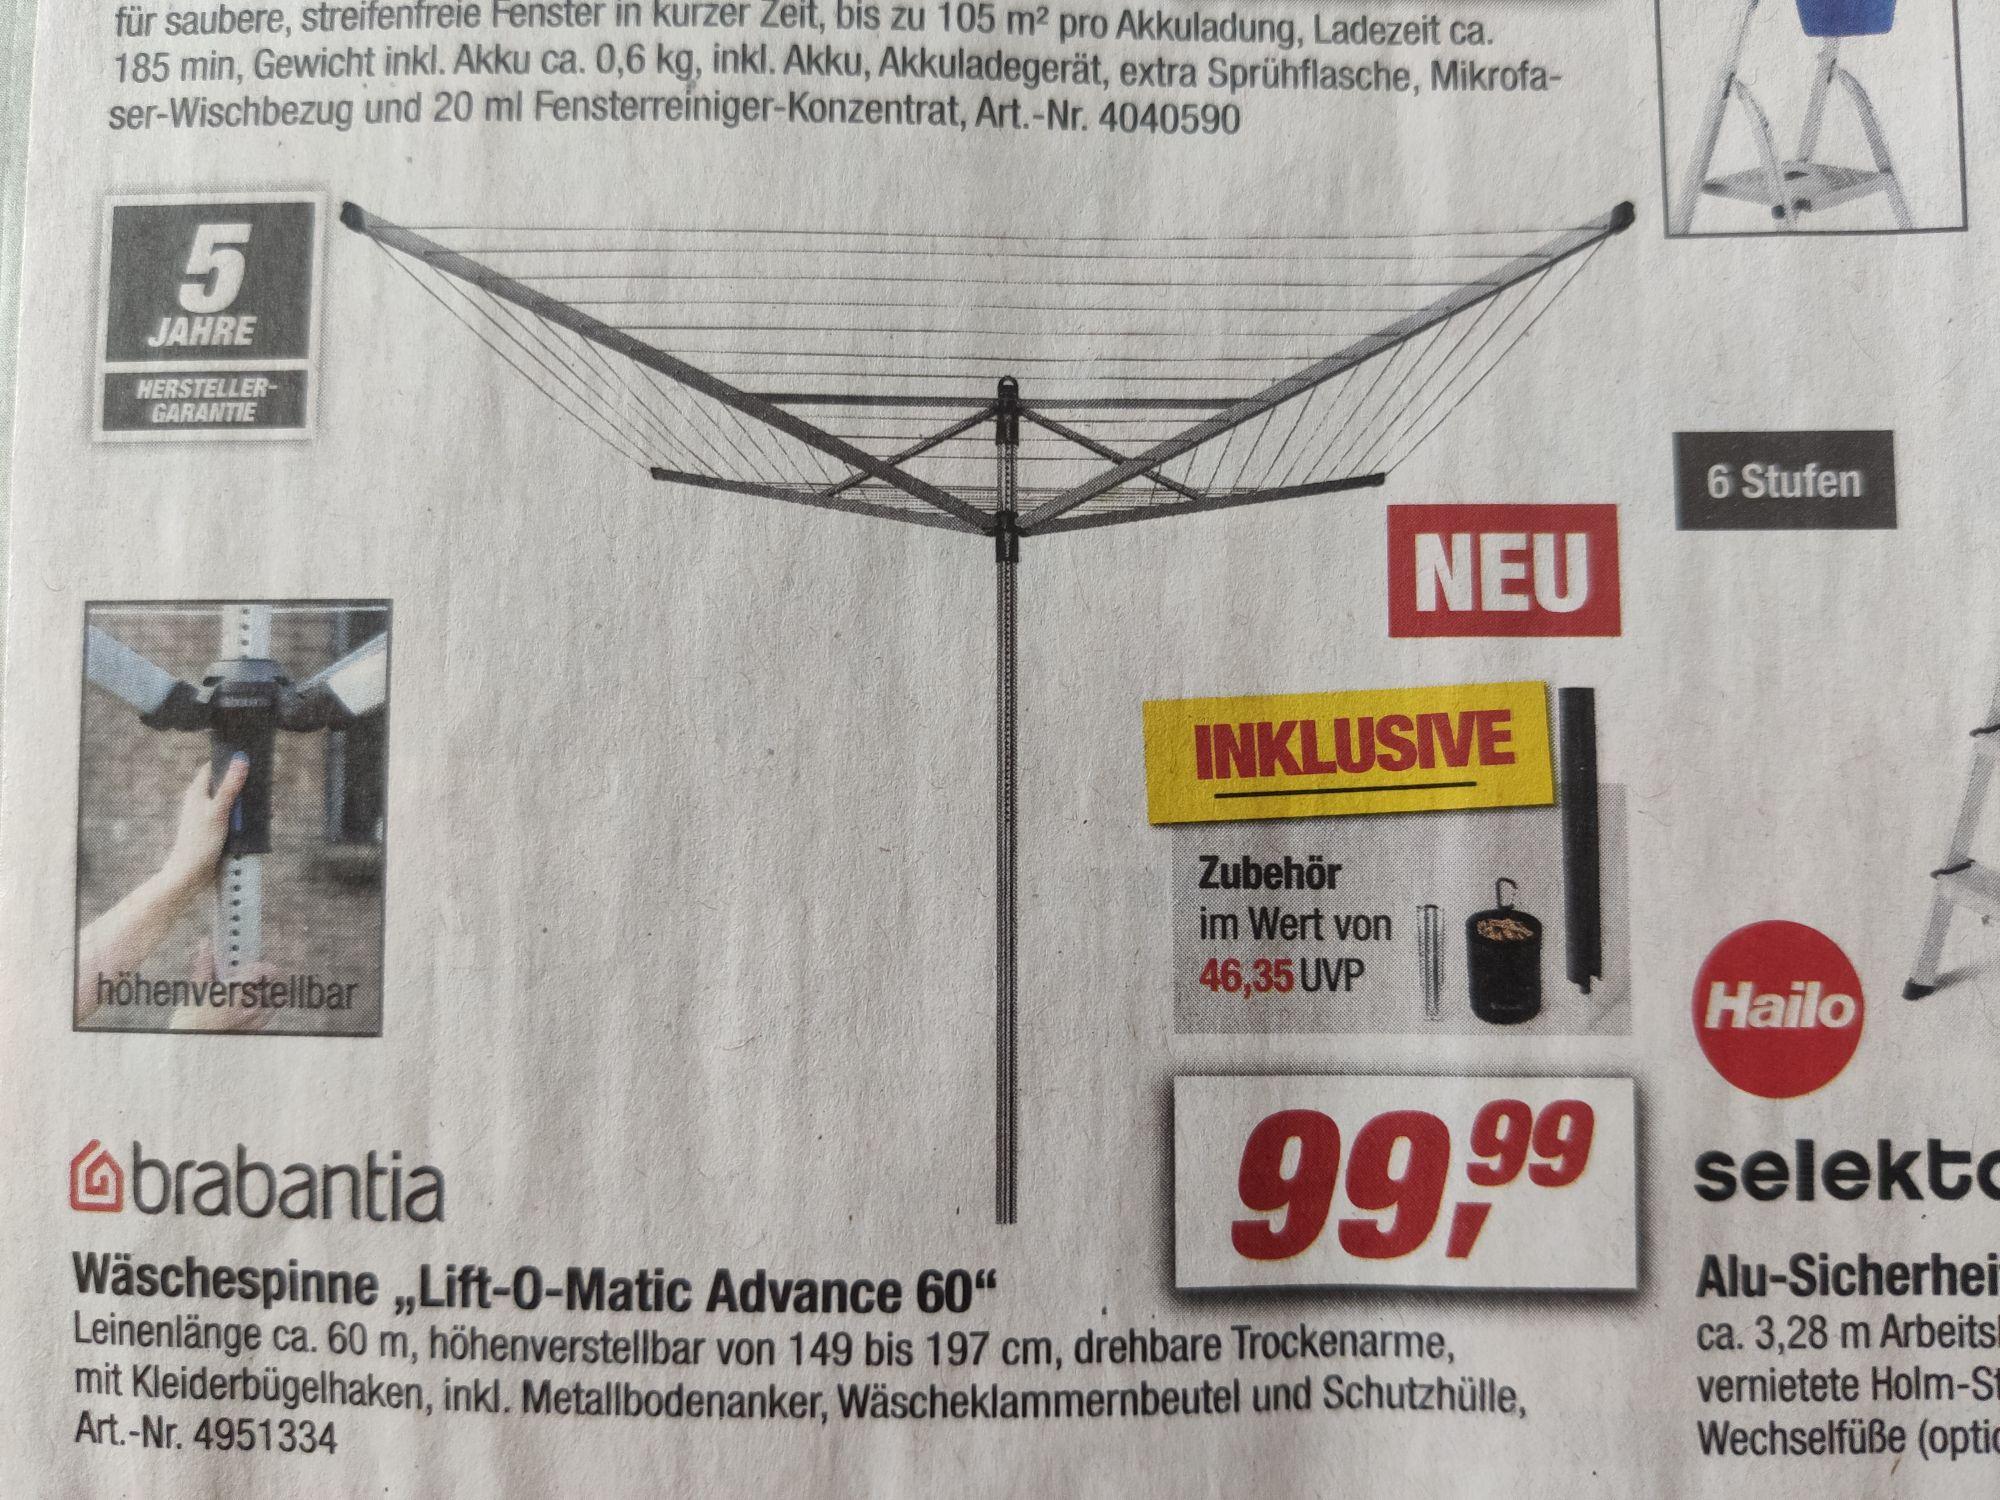 Wäschespinne Brabantia Lift-O-Matic Advance 60